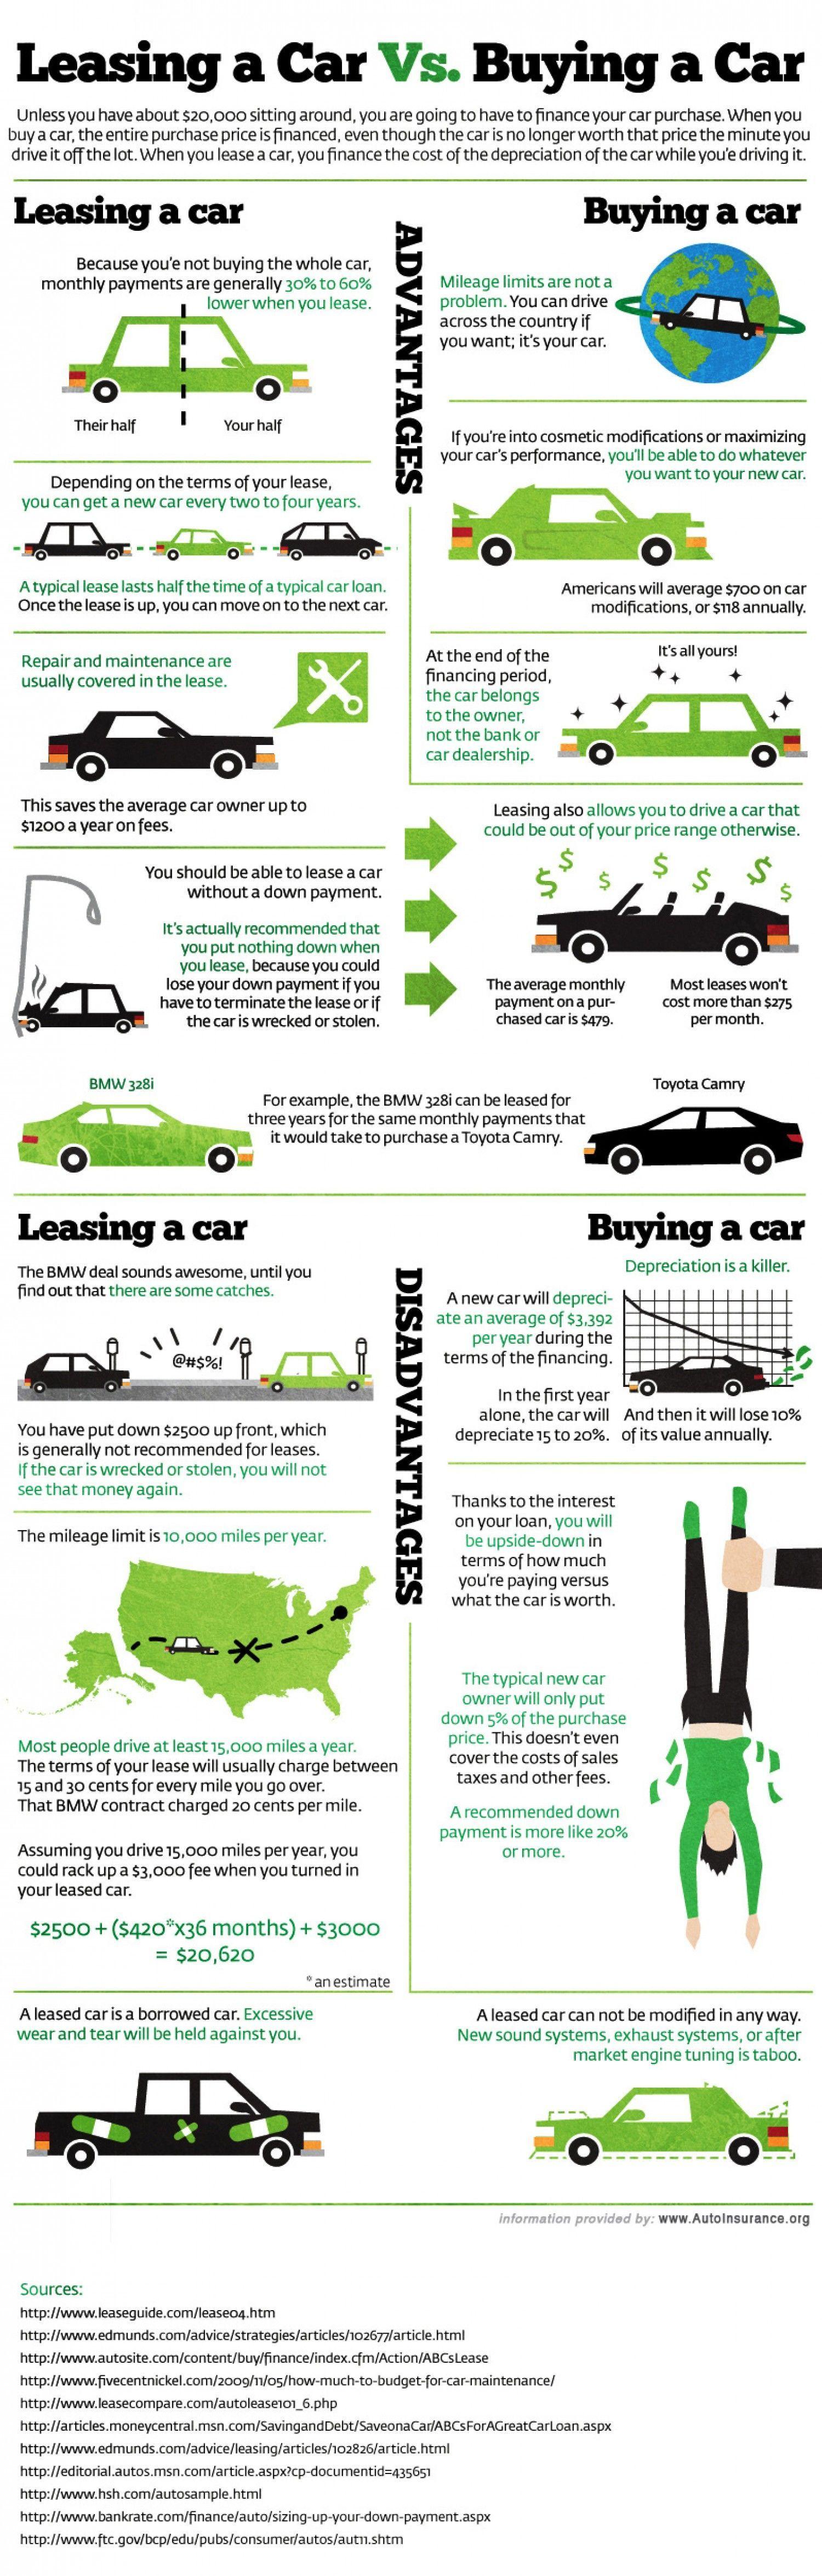 buying a car versus leasing